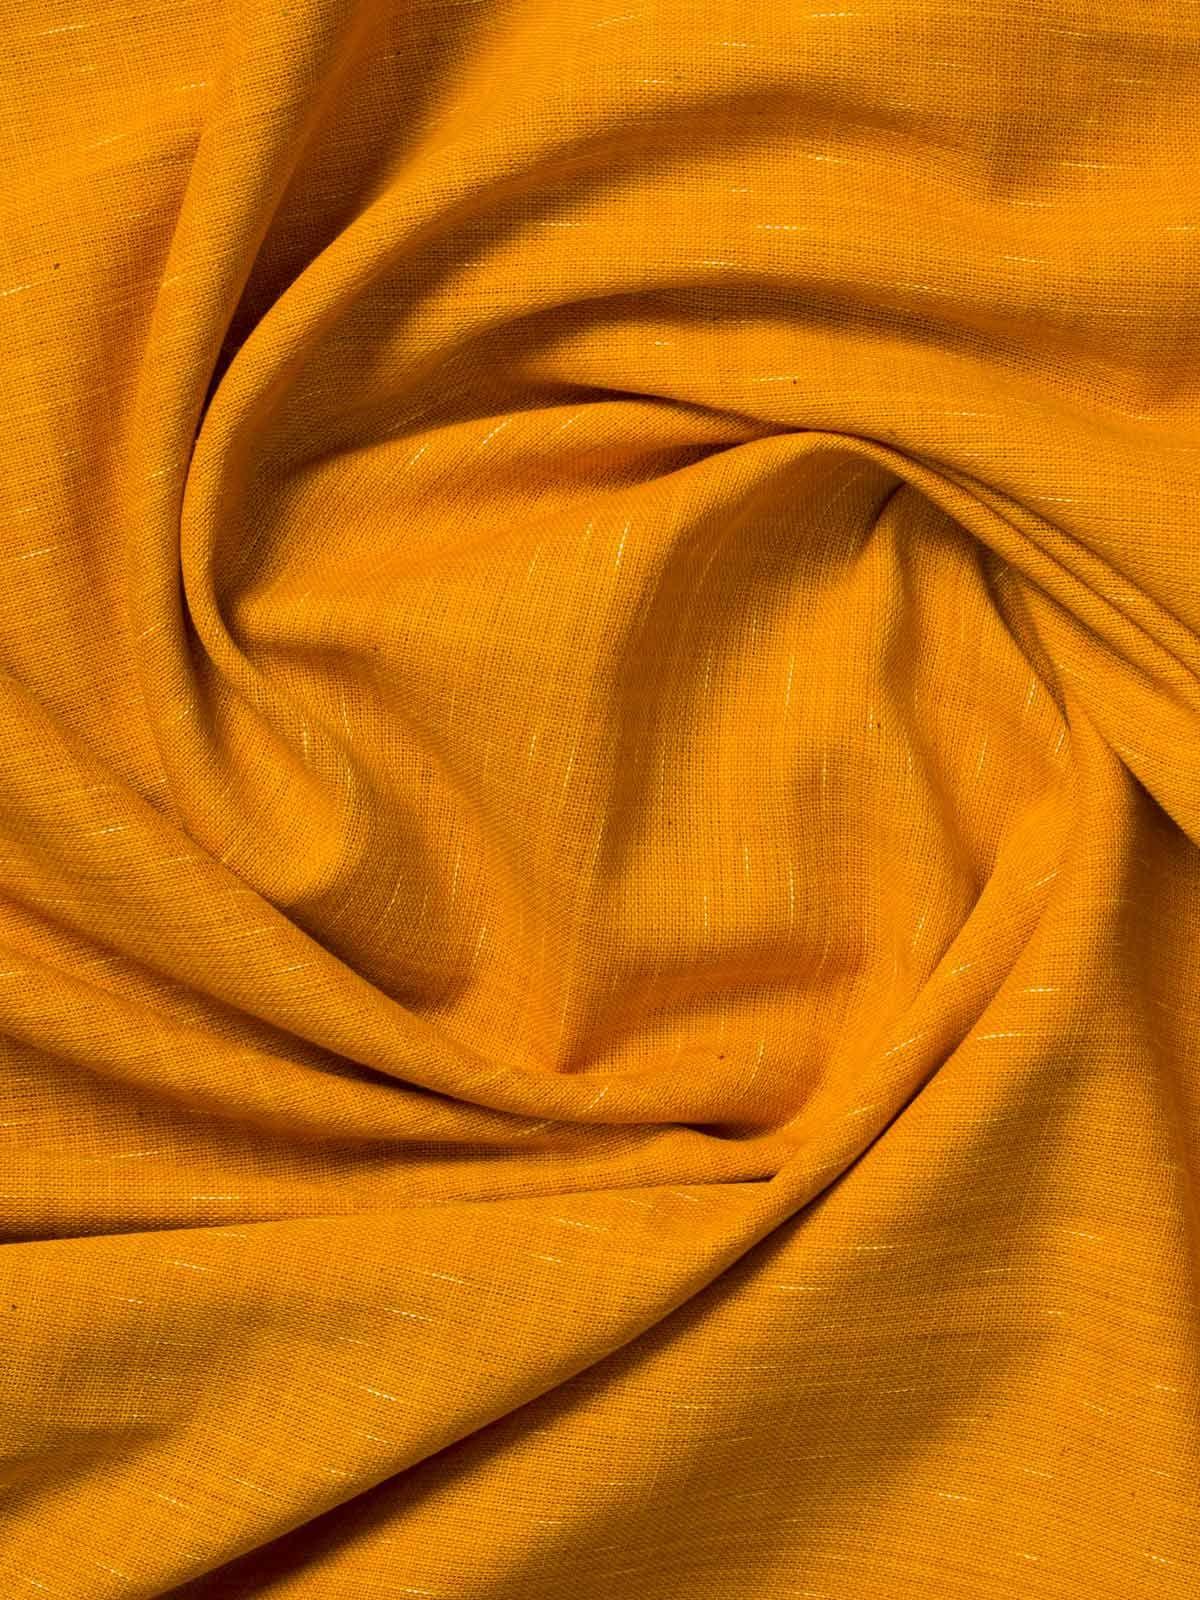 Carrot orange color handloom cotton fabric